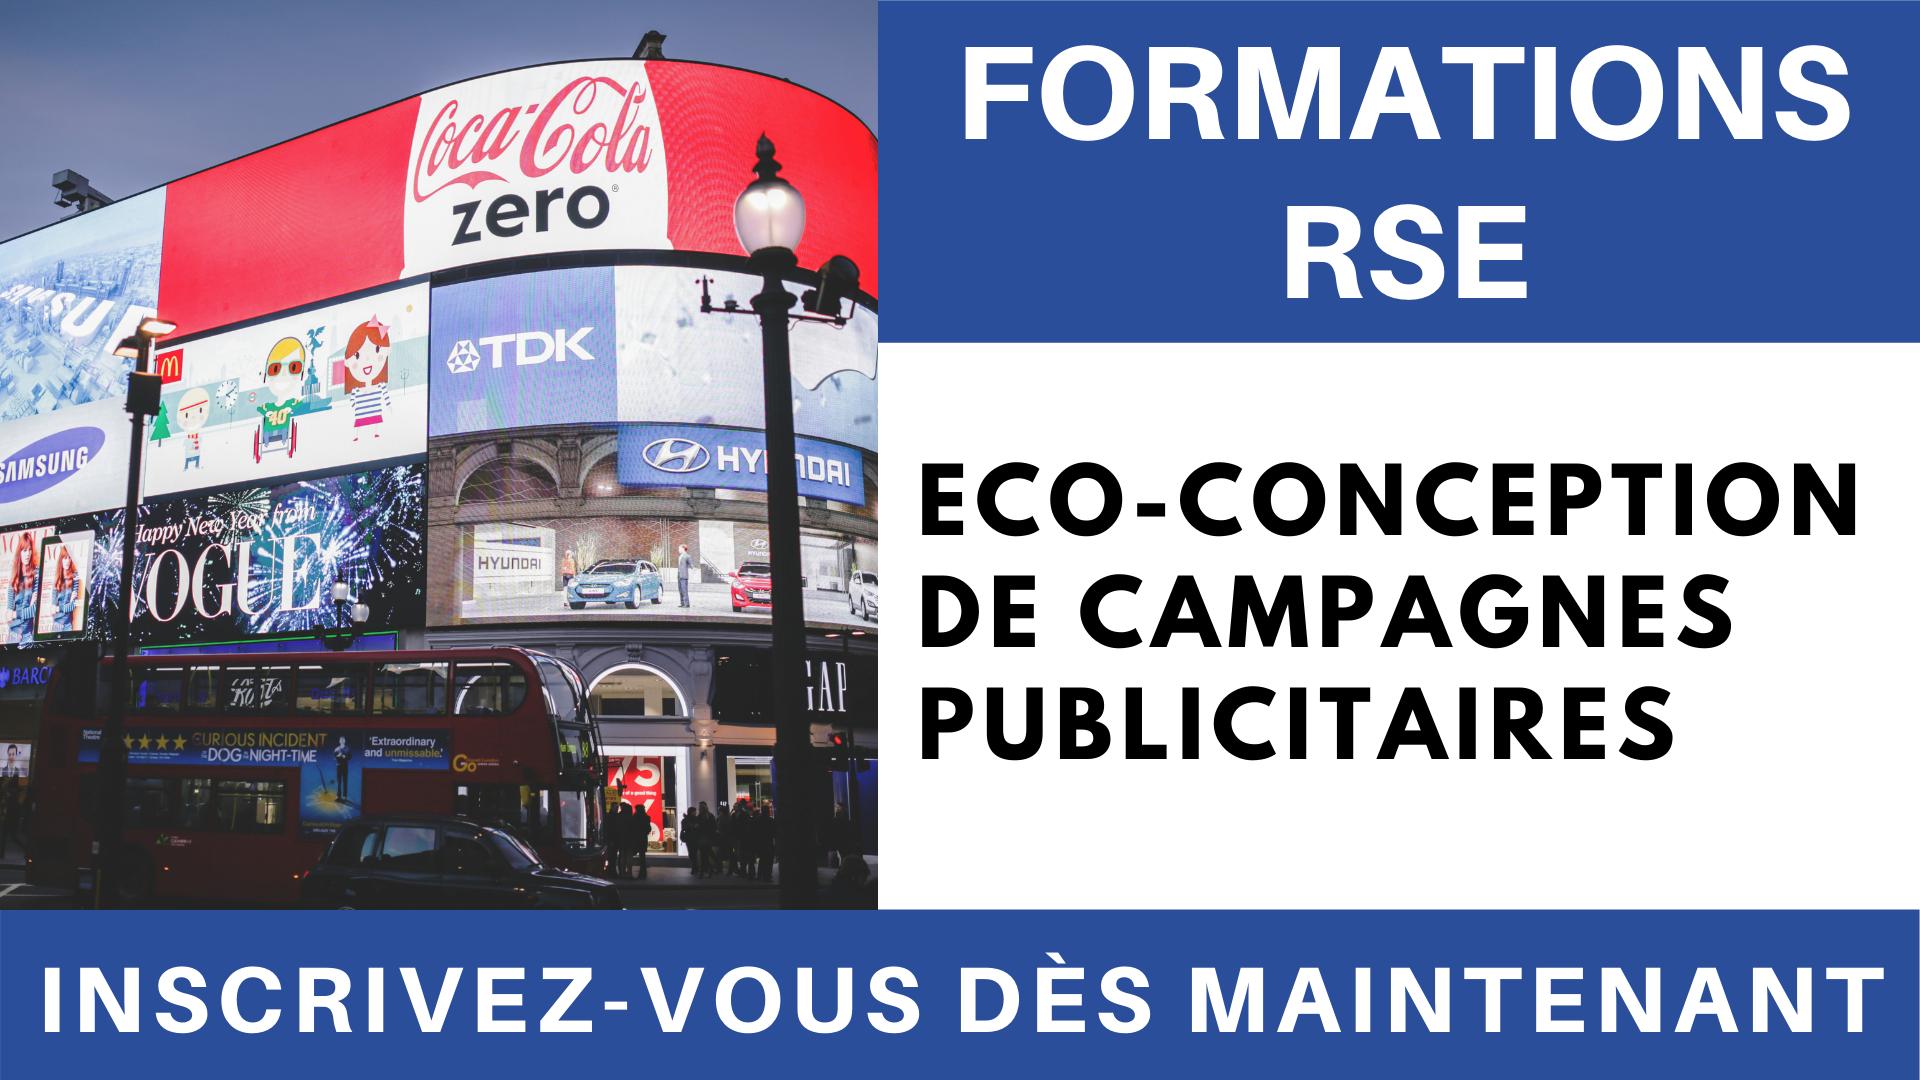 Vidéo - Formation RSE _ Eco-conception de campagnes publicitaires